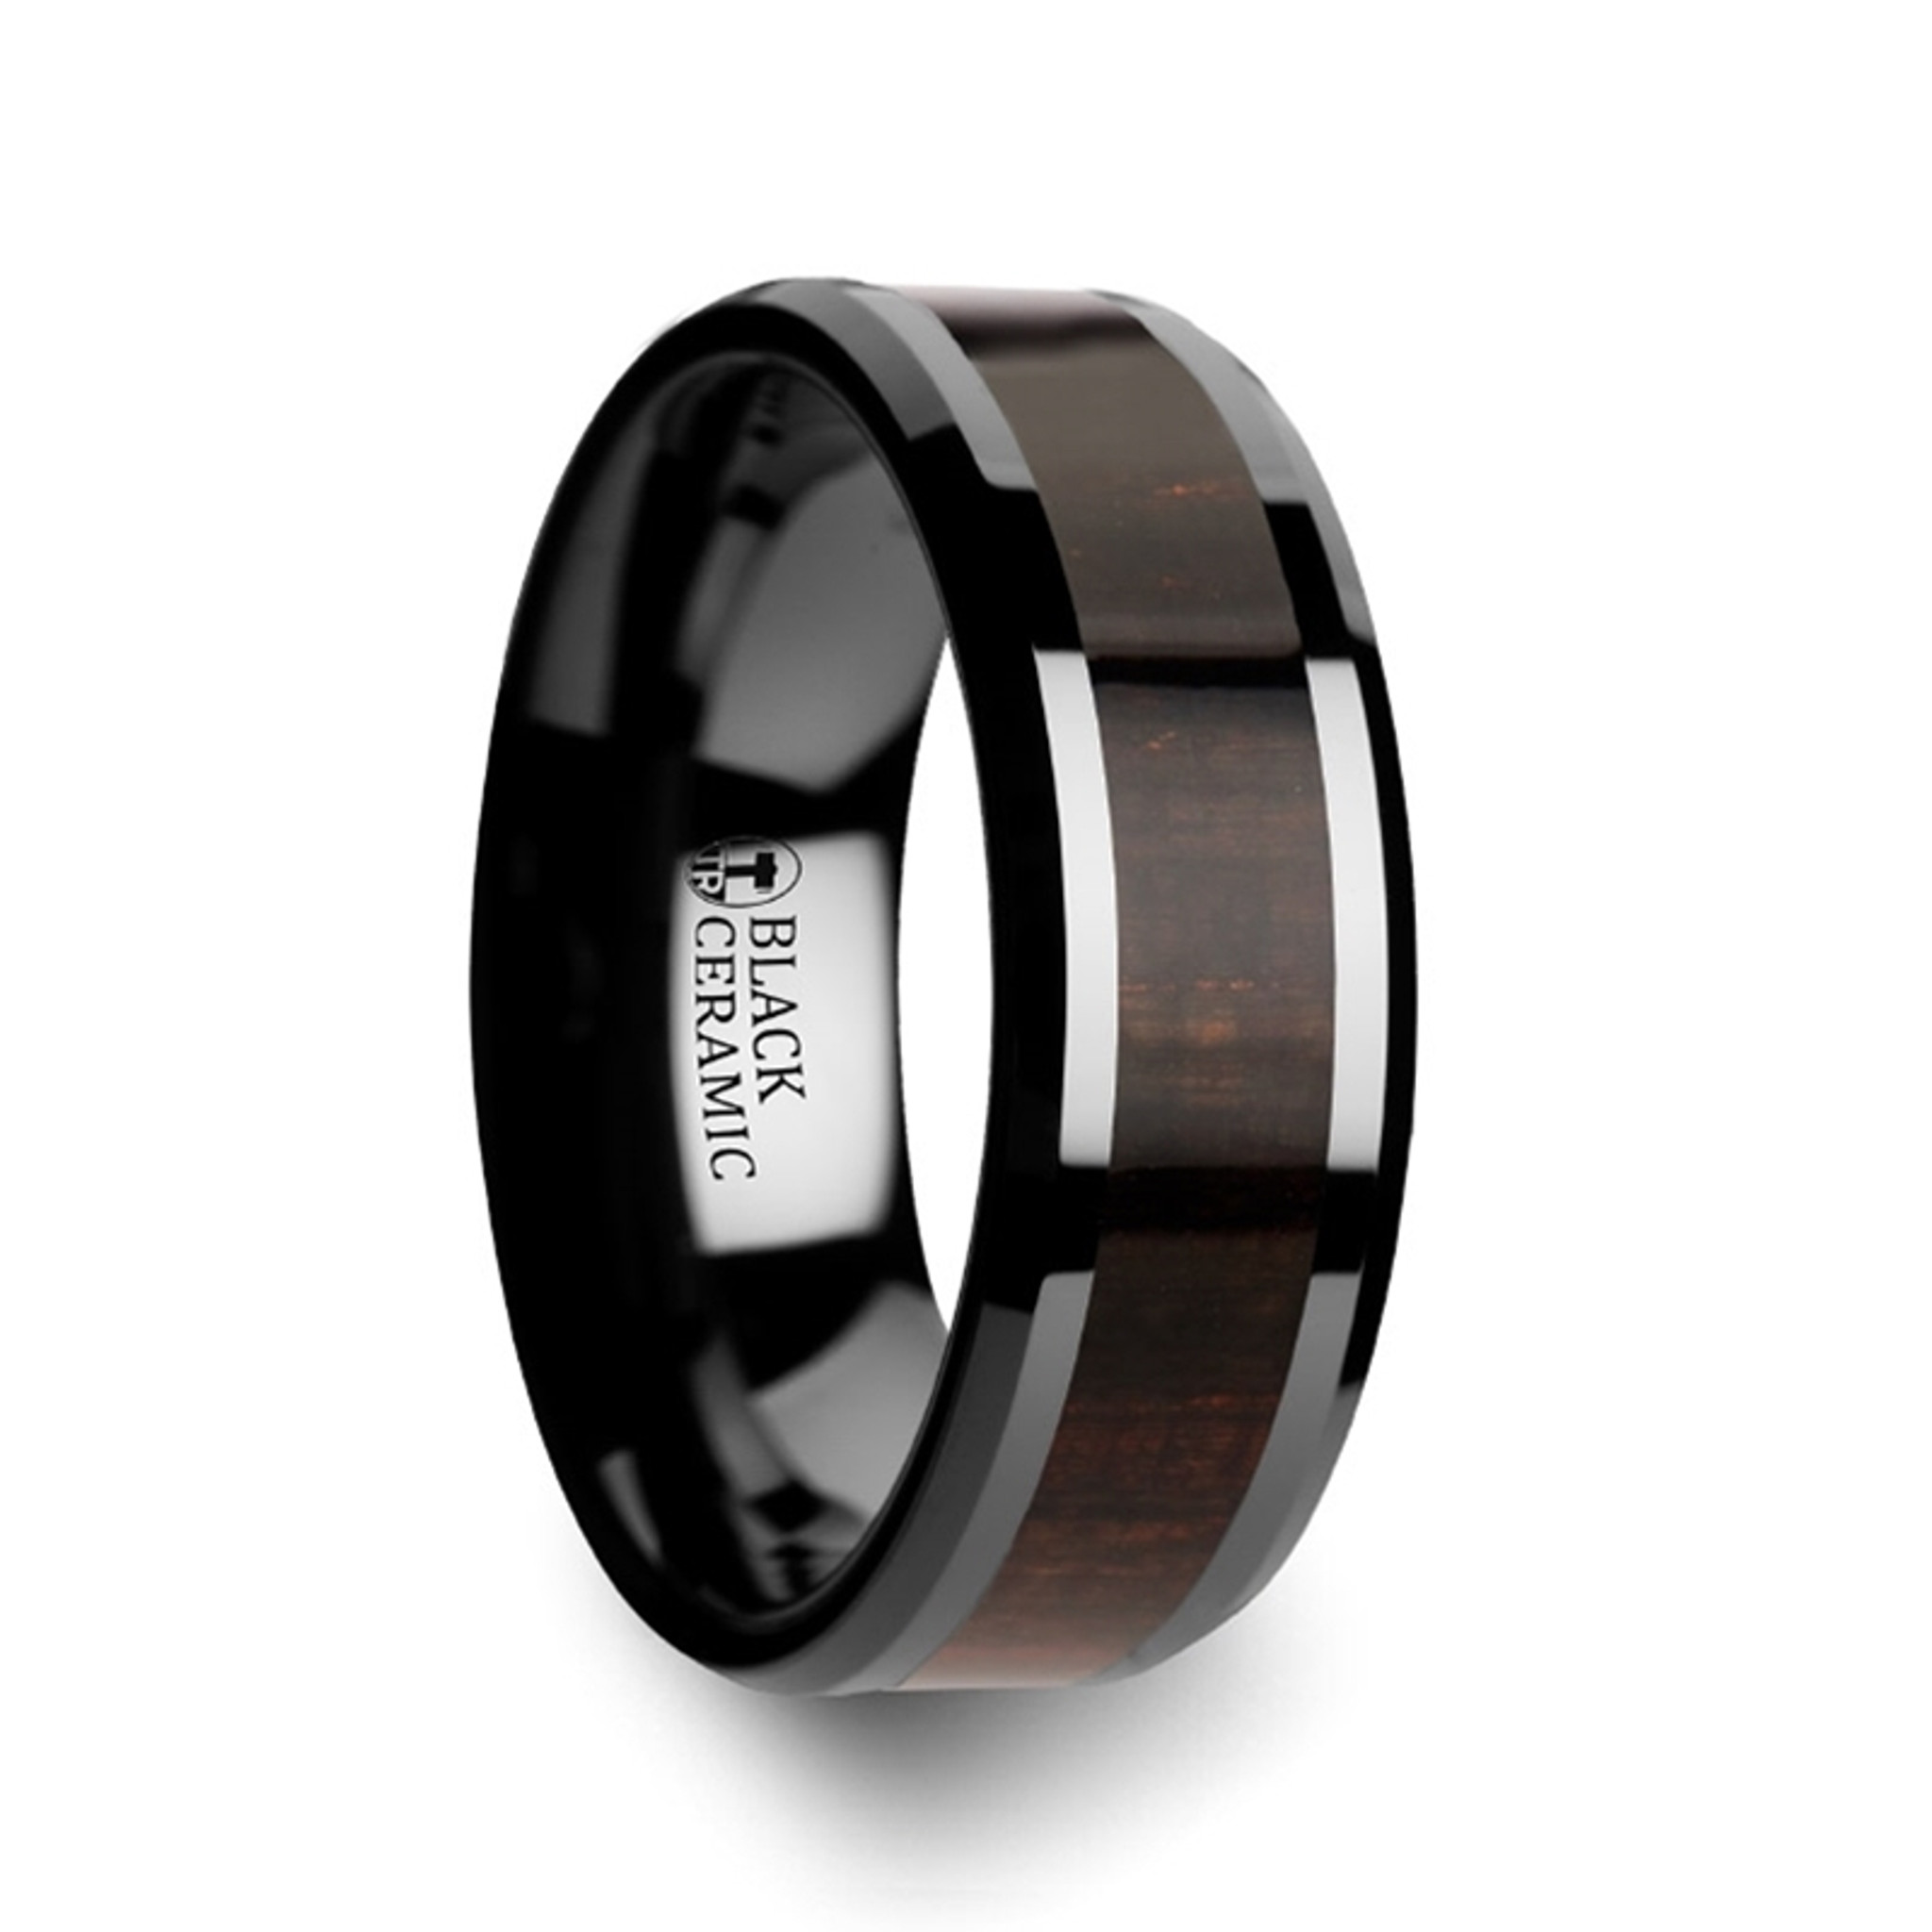 The Ember Ring Handmade Black Ceramic Custom Ring Glow in the Dark Ring for Men /& Women Black Fire Blue Charcoal Opal Inlay Ring